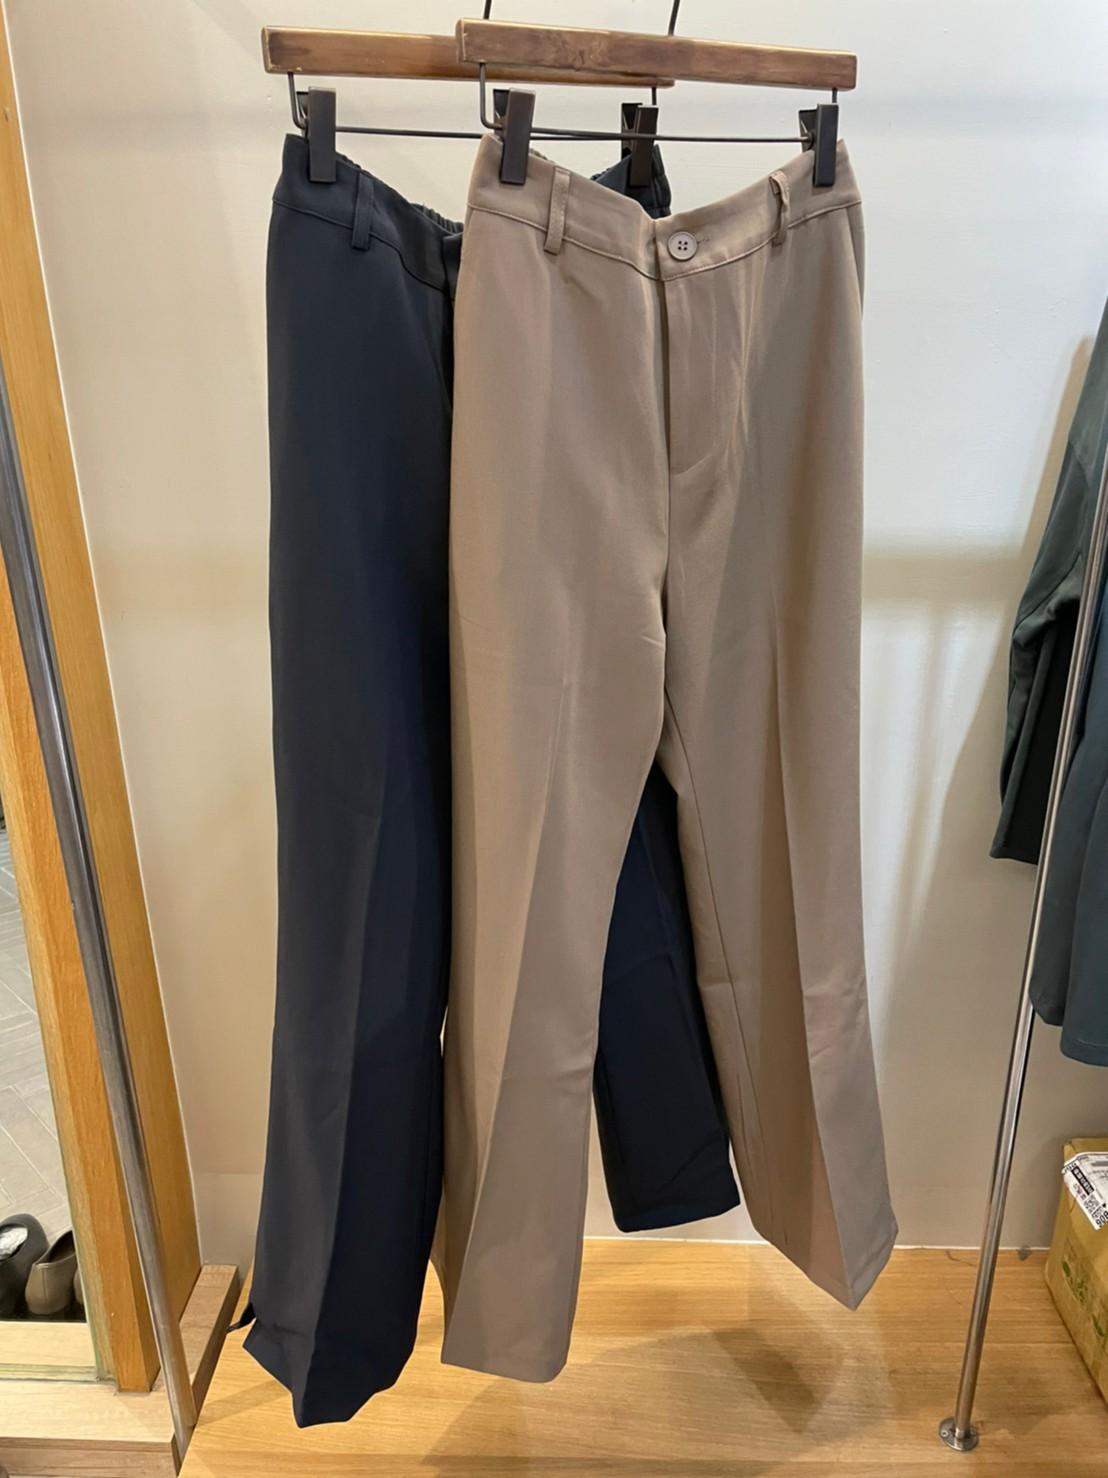 (n31)自訂款的挺西裝褲